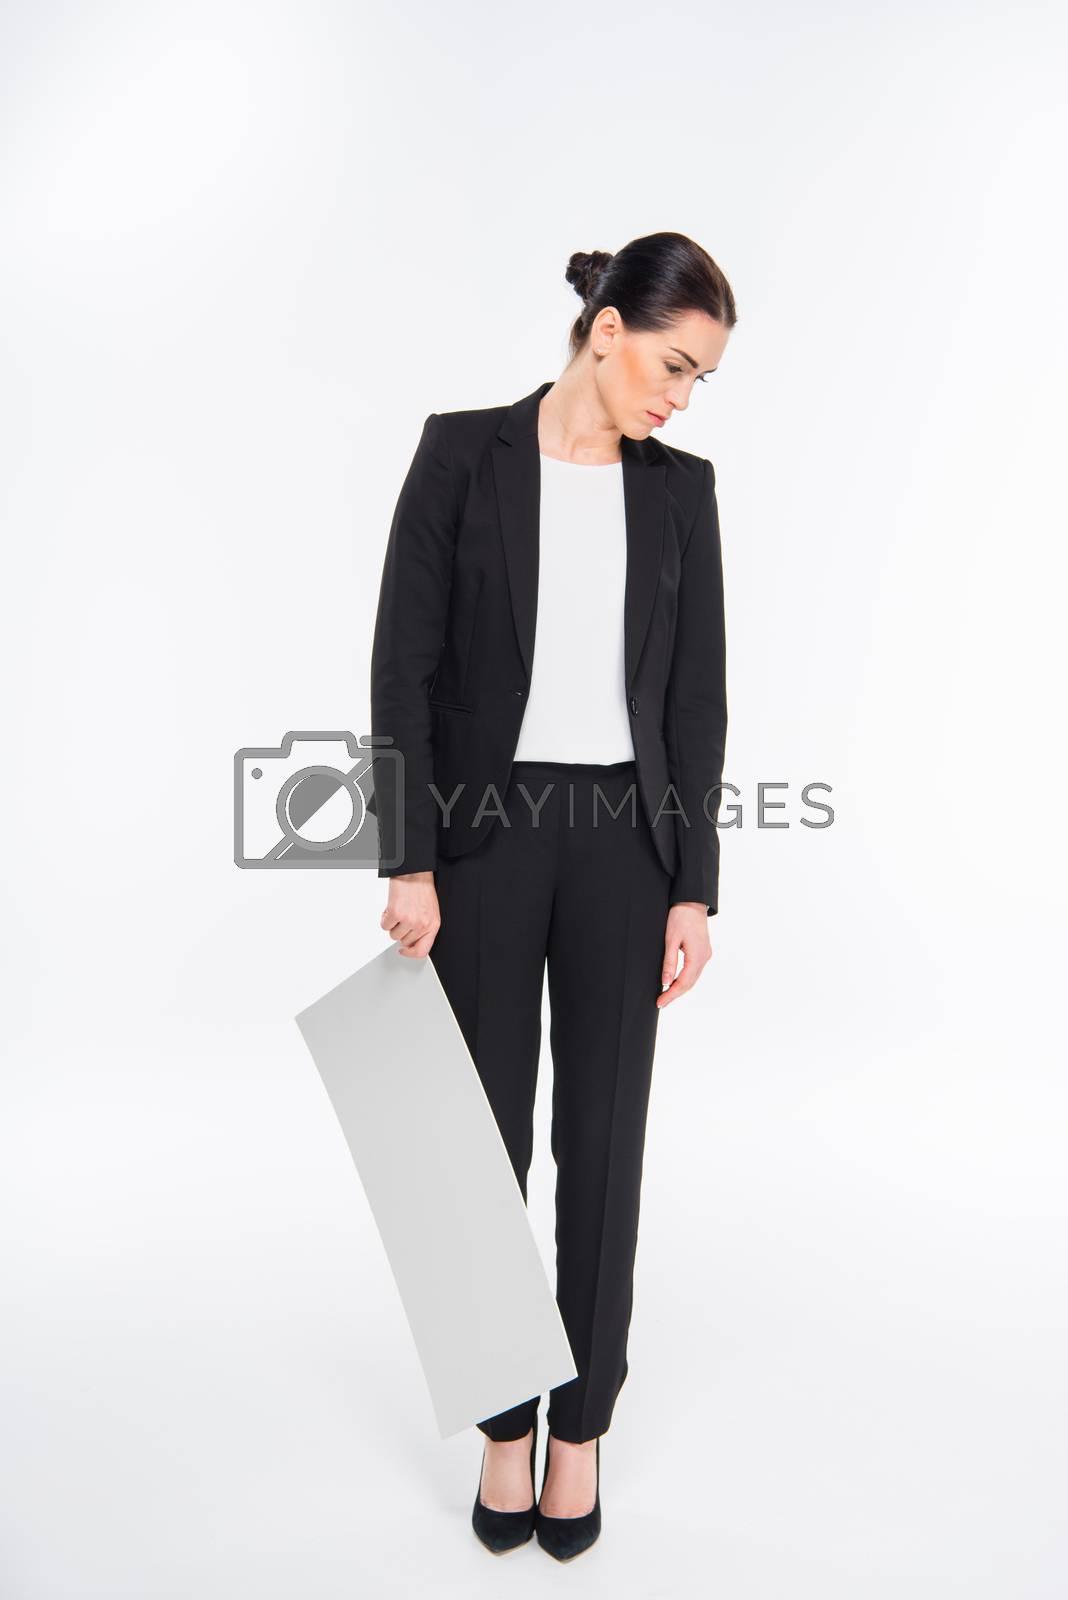 Businesswoman holding blank card by LightFieldStudios